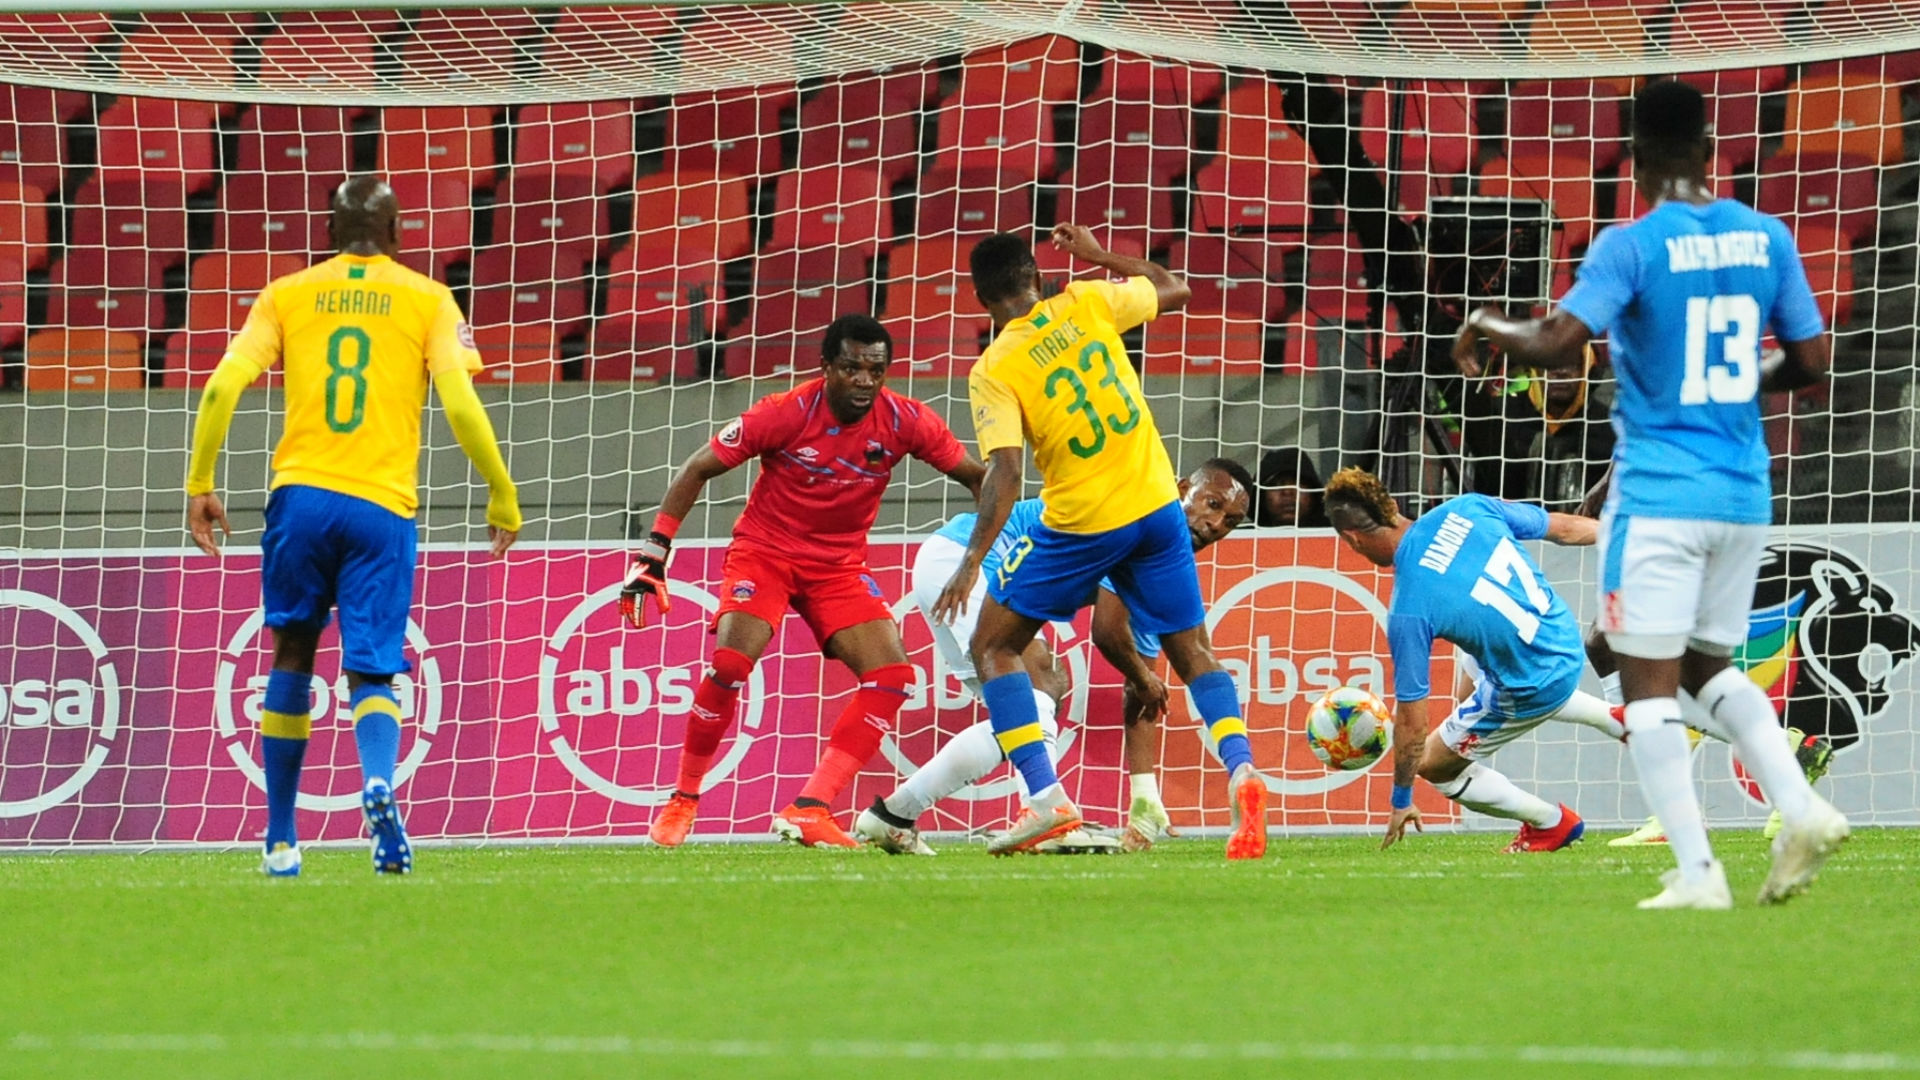 Mamelodi Sundowns vs Chippa United Preview: Kick-off time, TV channel, squad news